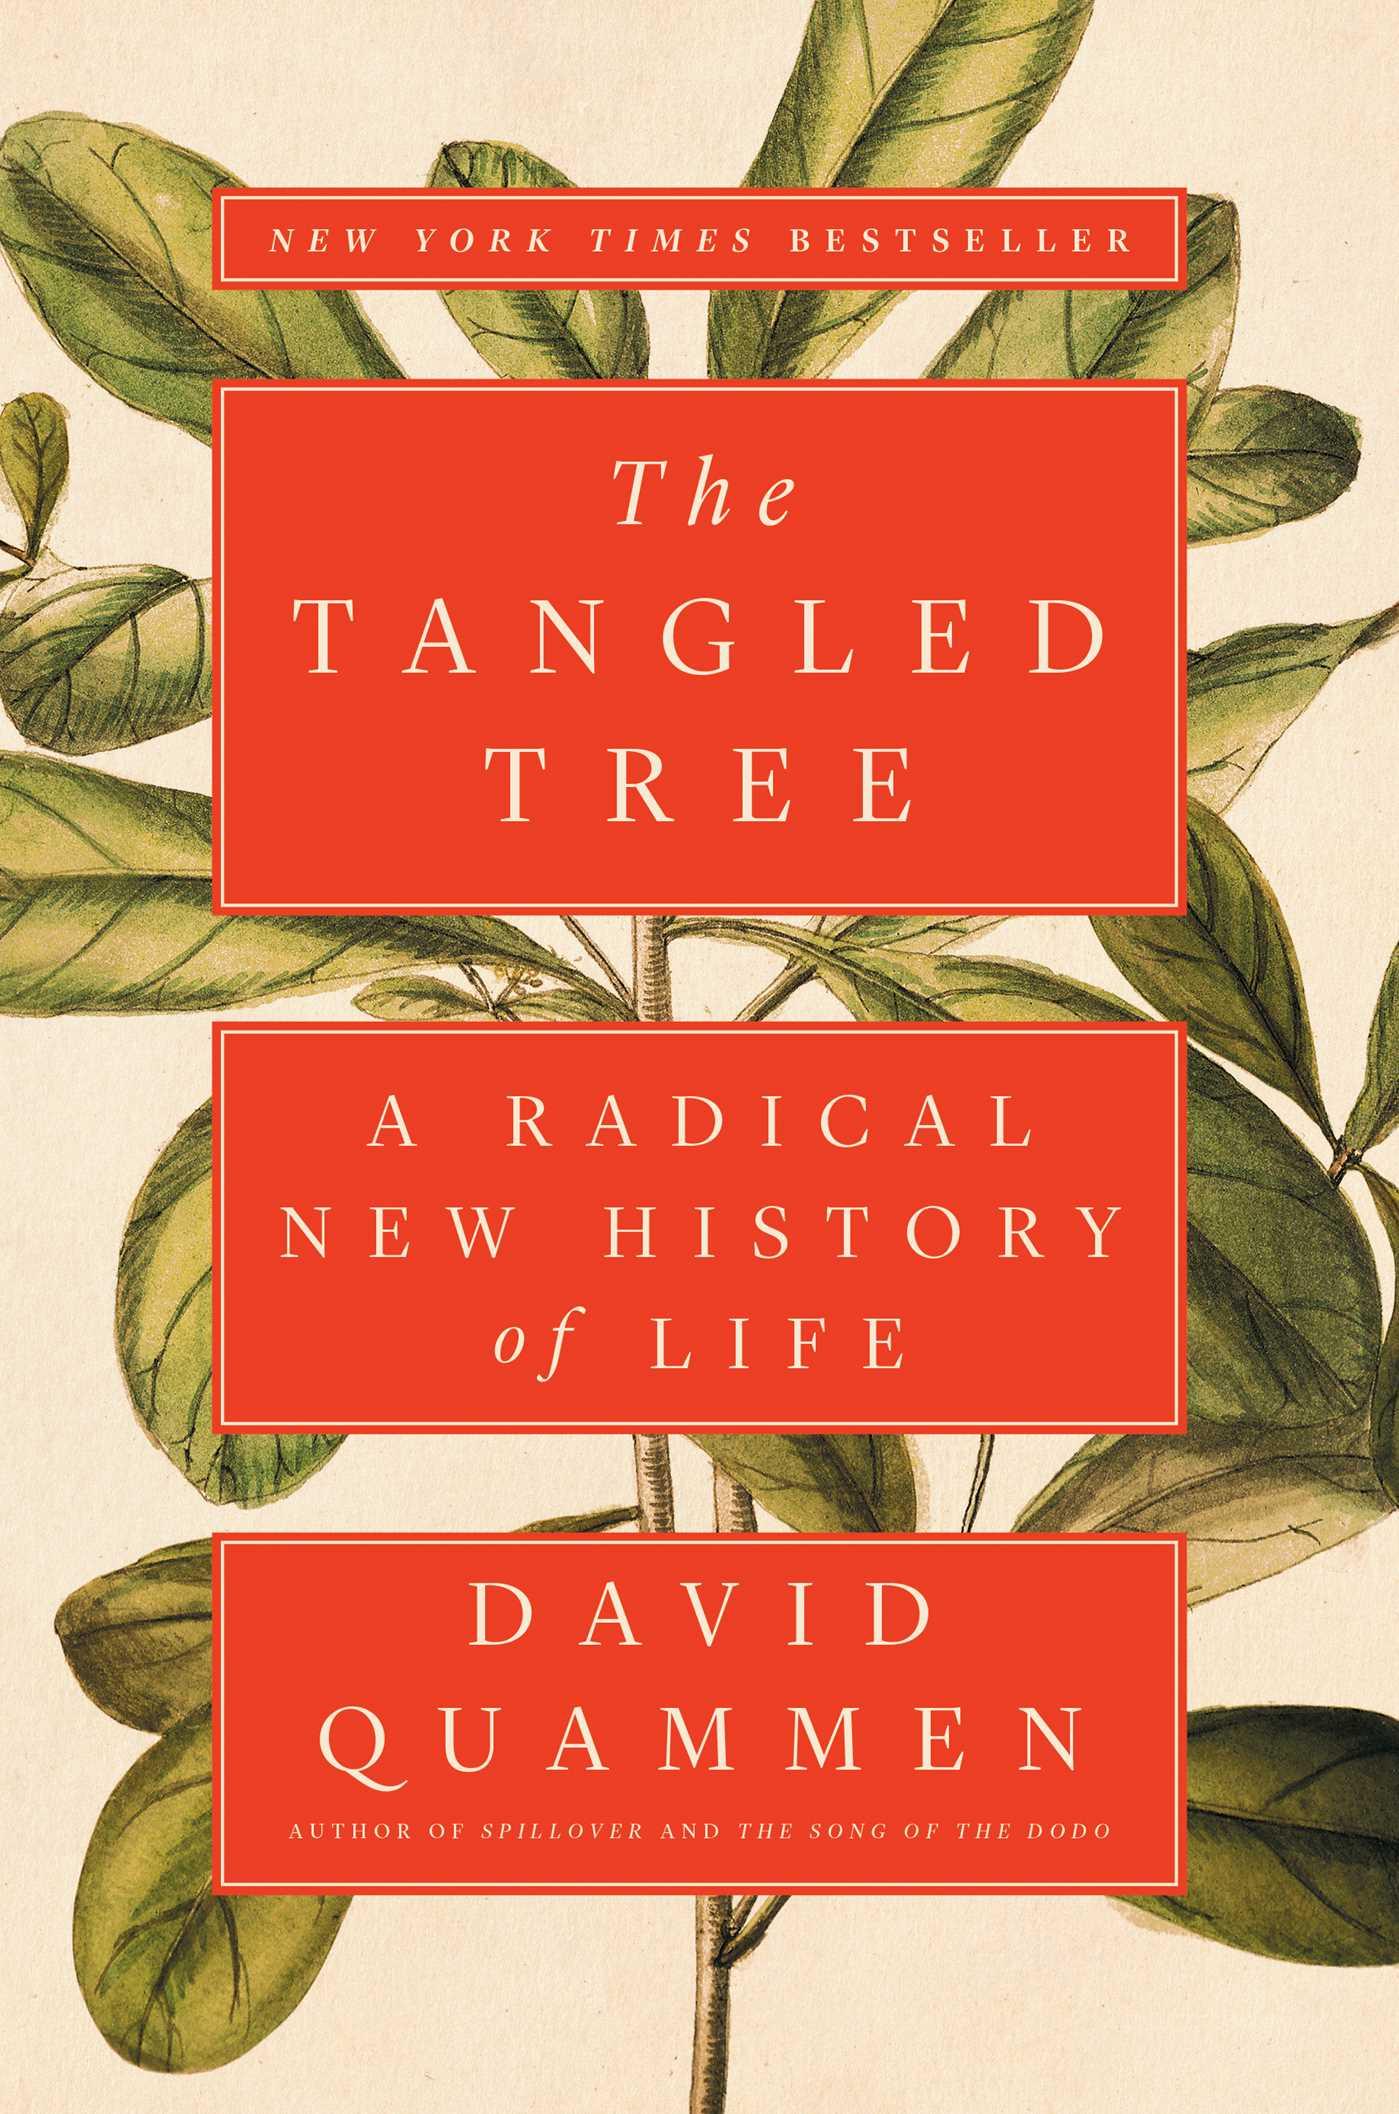 the tangled tree.jpg